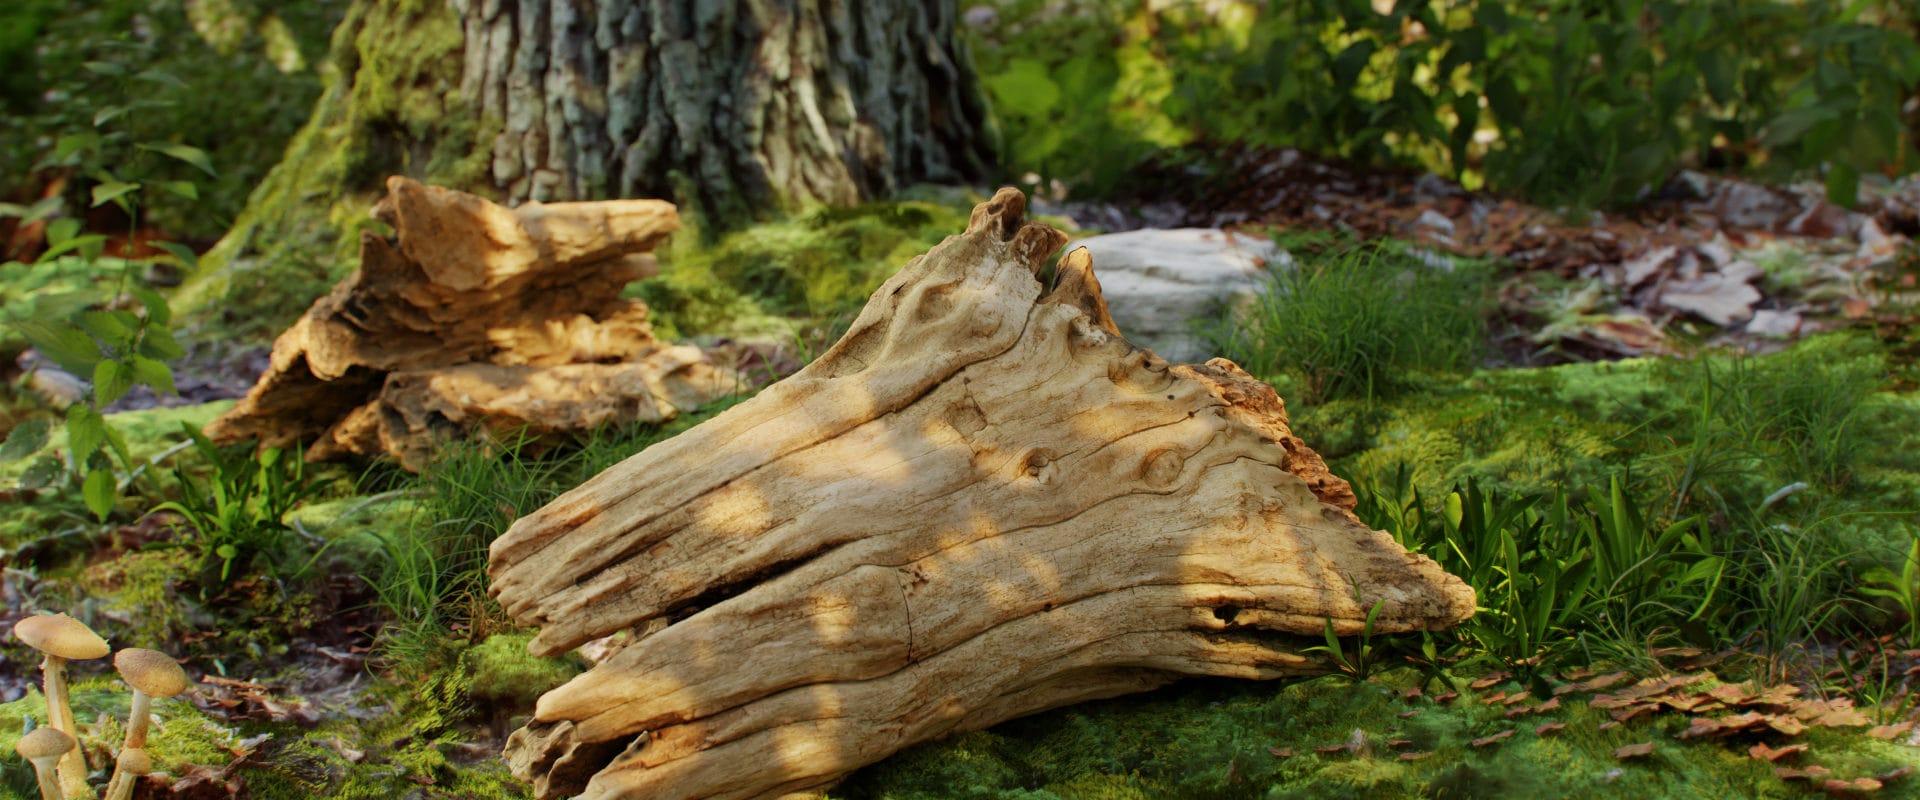 Wood piece_360°_7_58_